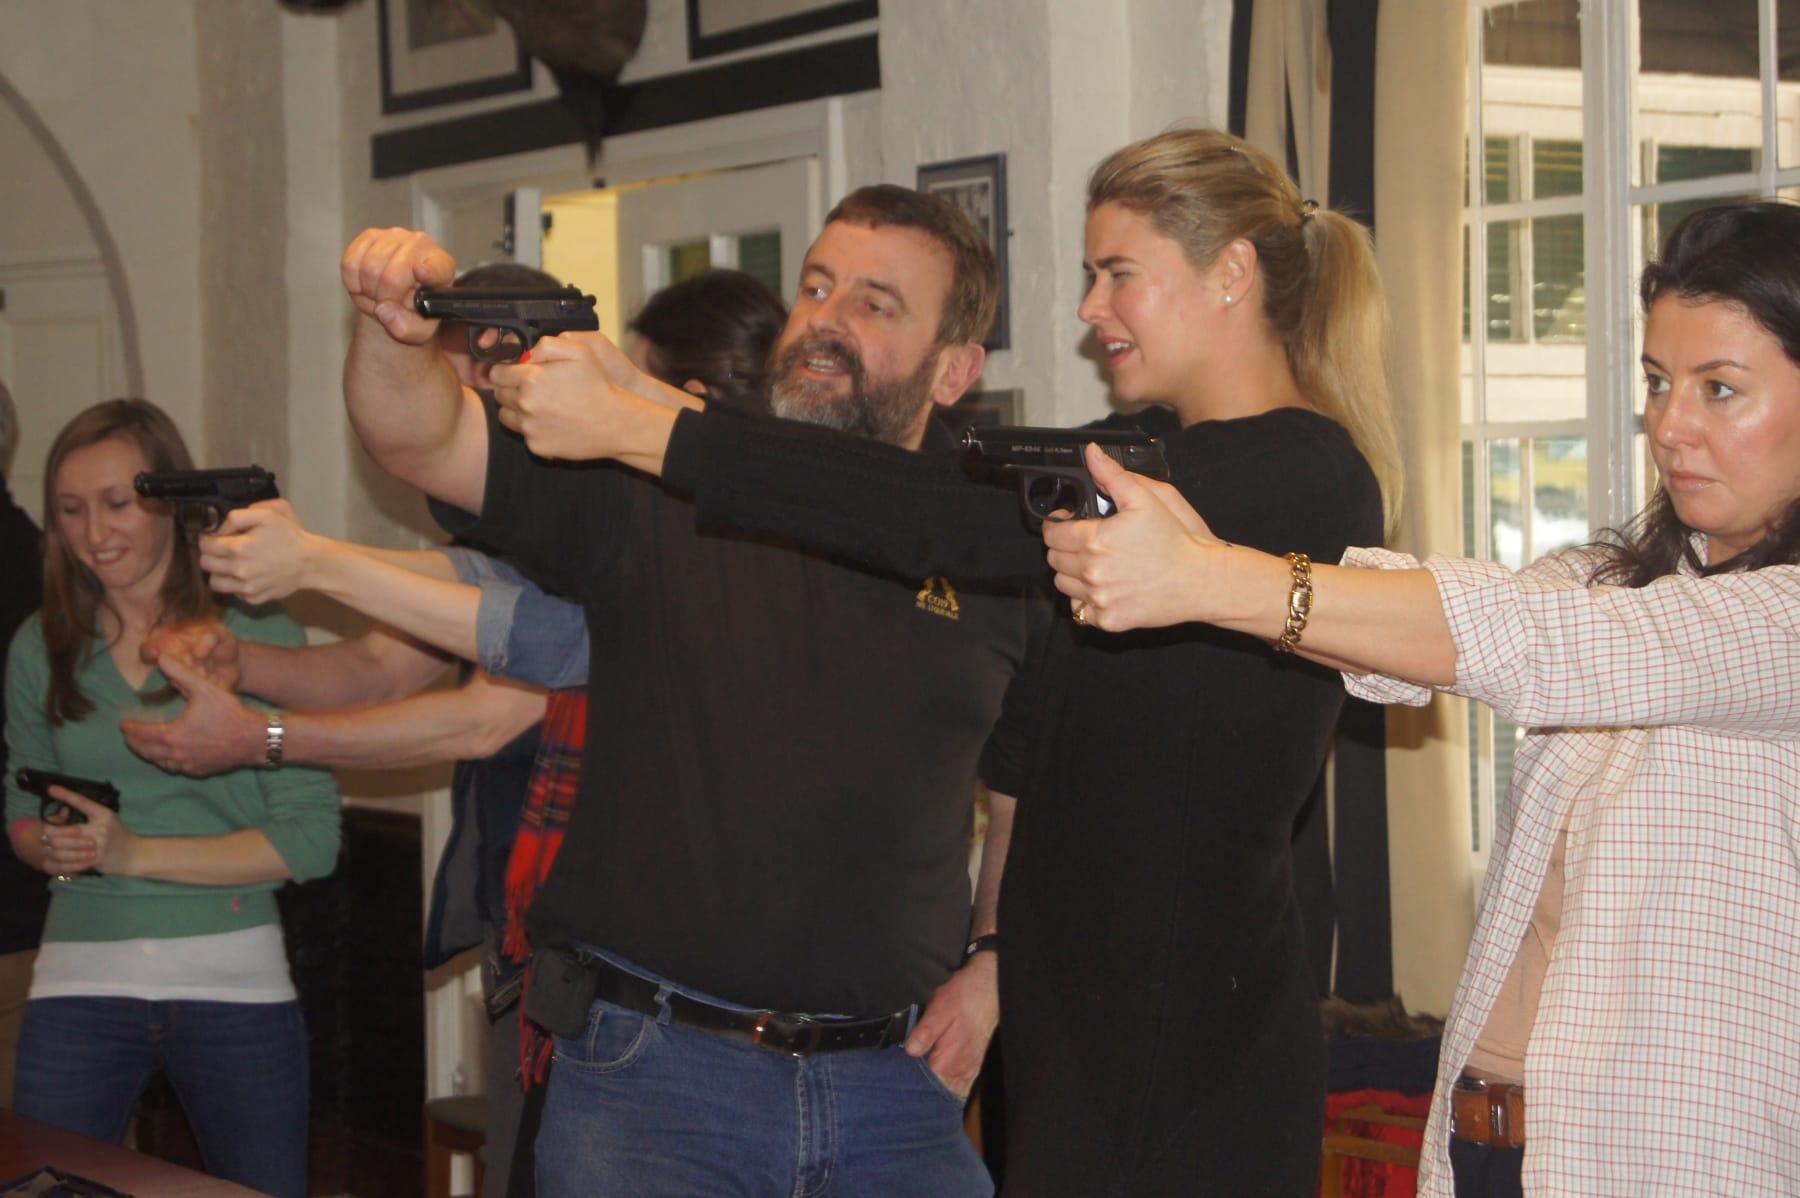 Pistol Instructon